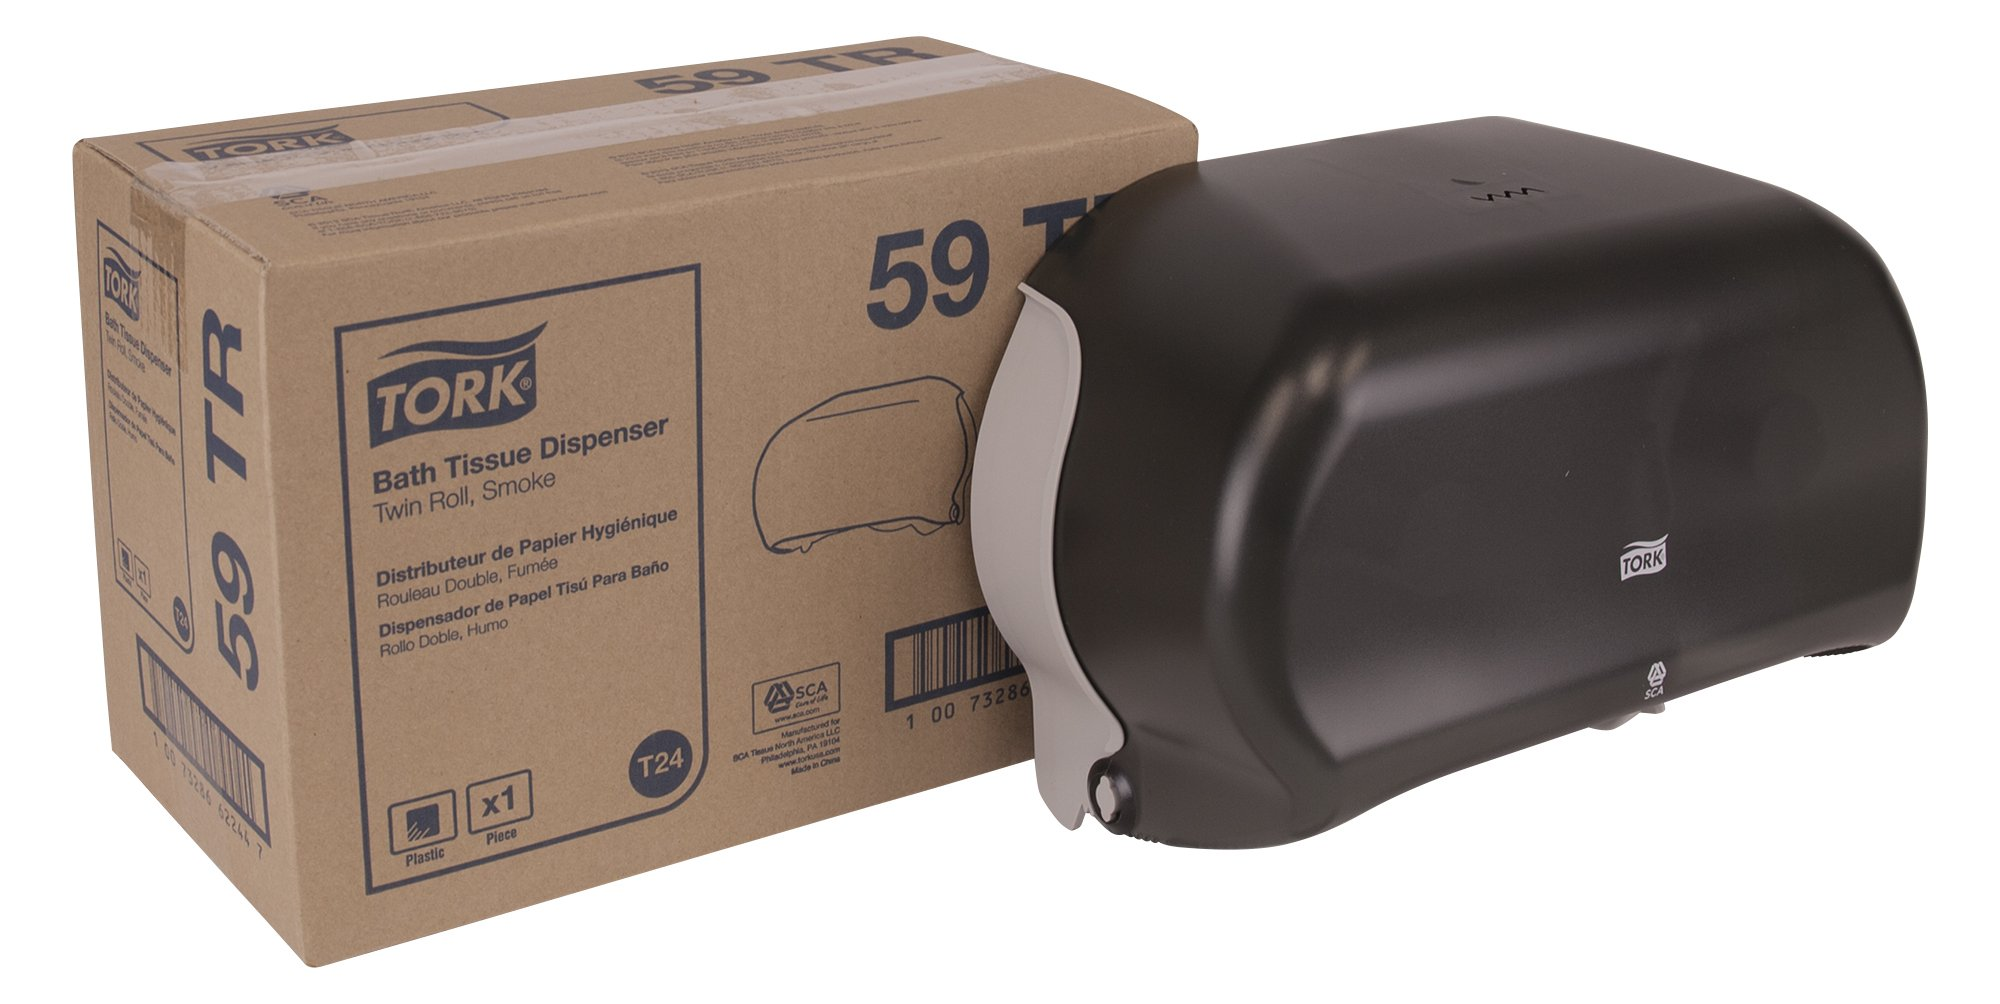 Tork 59TR Twin Bath Tissue Roll Dispenser, Plastic, 8.25'' Height x 12.75'' Width x 5.57'' Depth, Smoke (Case of 1) for use with Tork TM6511S, TM6512, TM6120S, TM6130S, TM1602